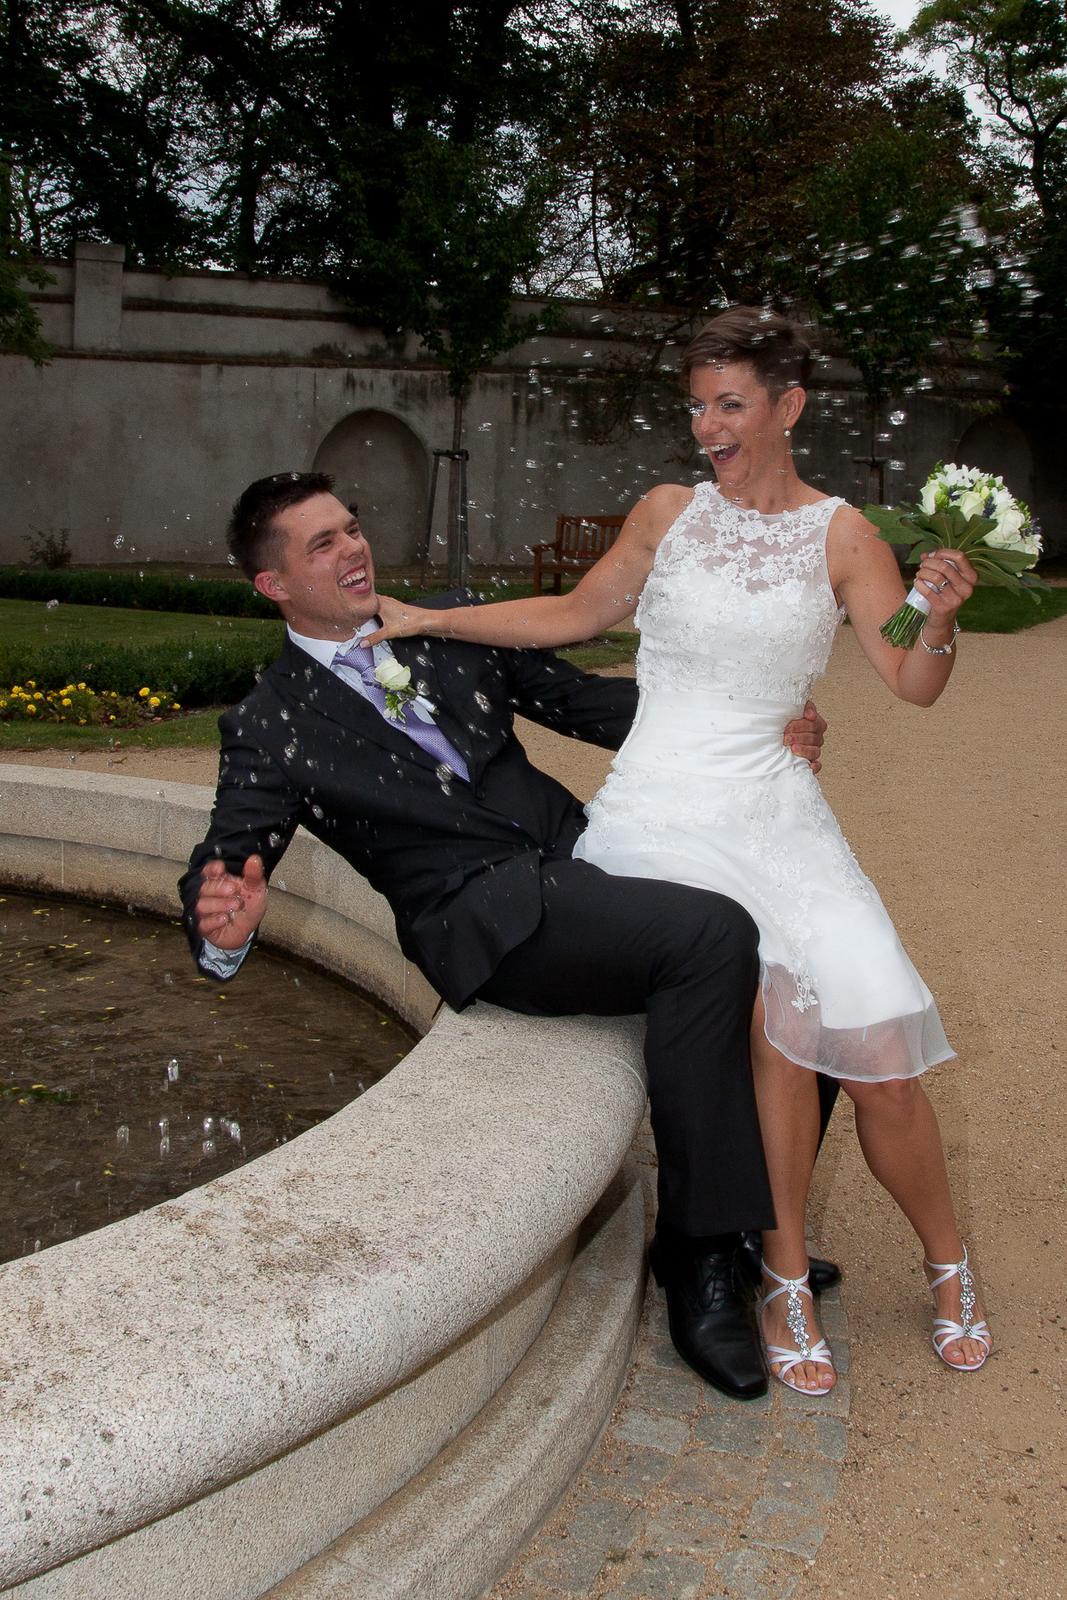 Svatba Zámek Benátky nad Jizerou - Obrázek č. 5